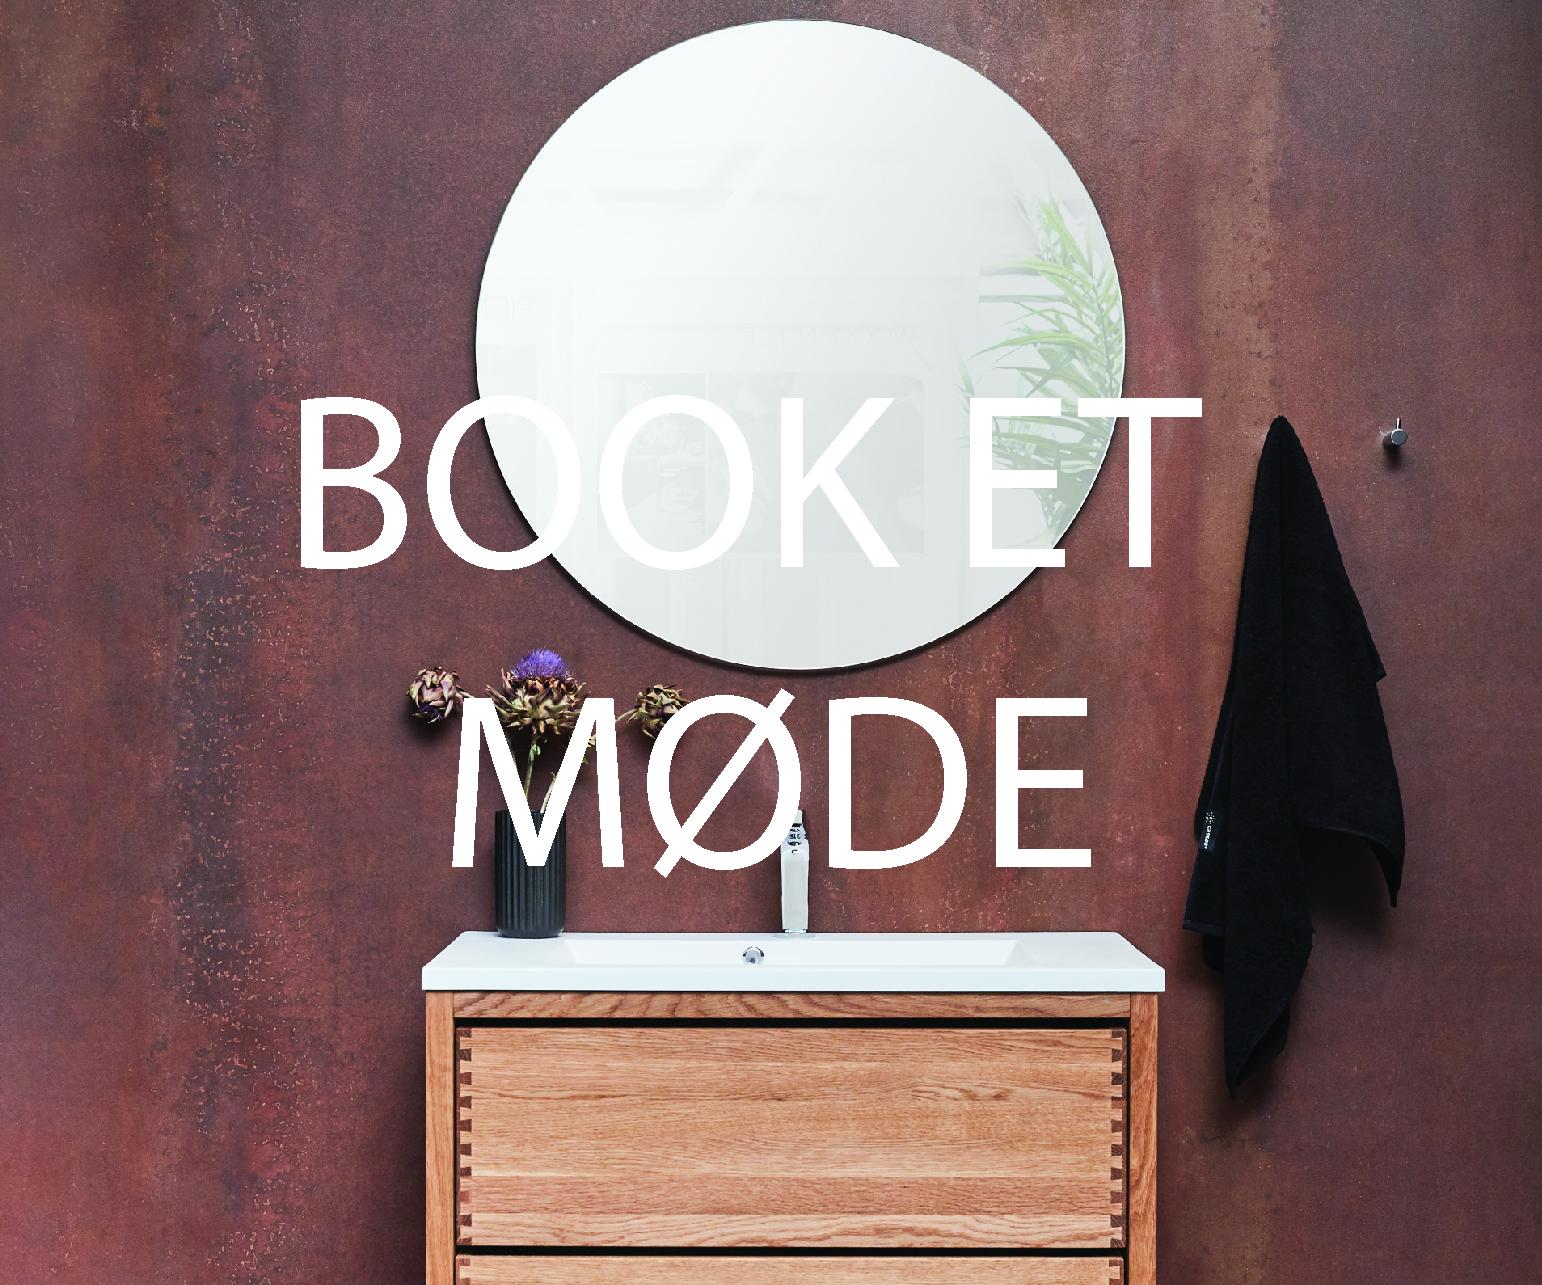 Book et møde